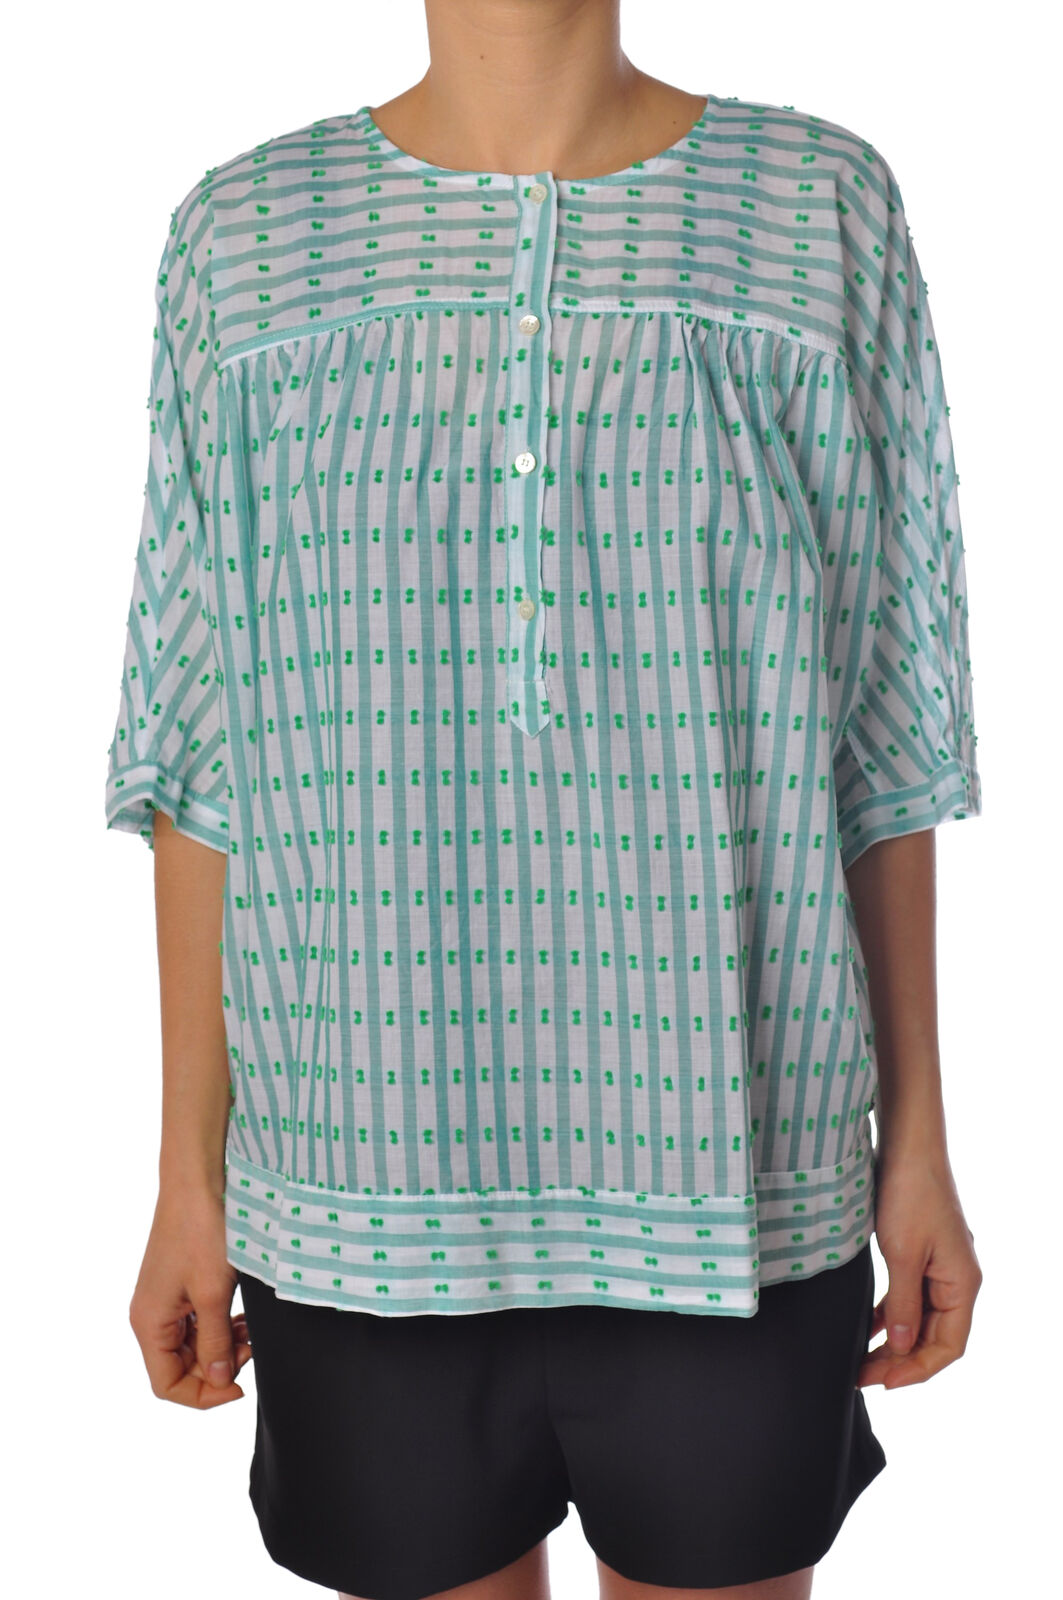 Ottod'ame  -  Shirt - Female - Weiß - 1915616A183544